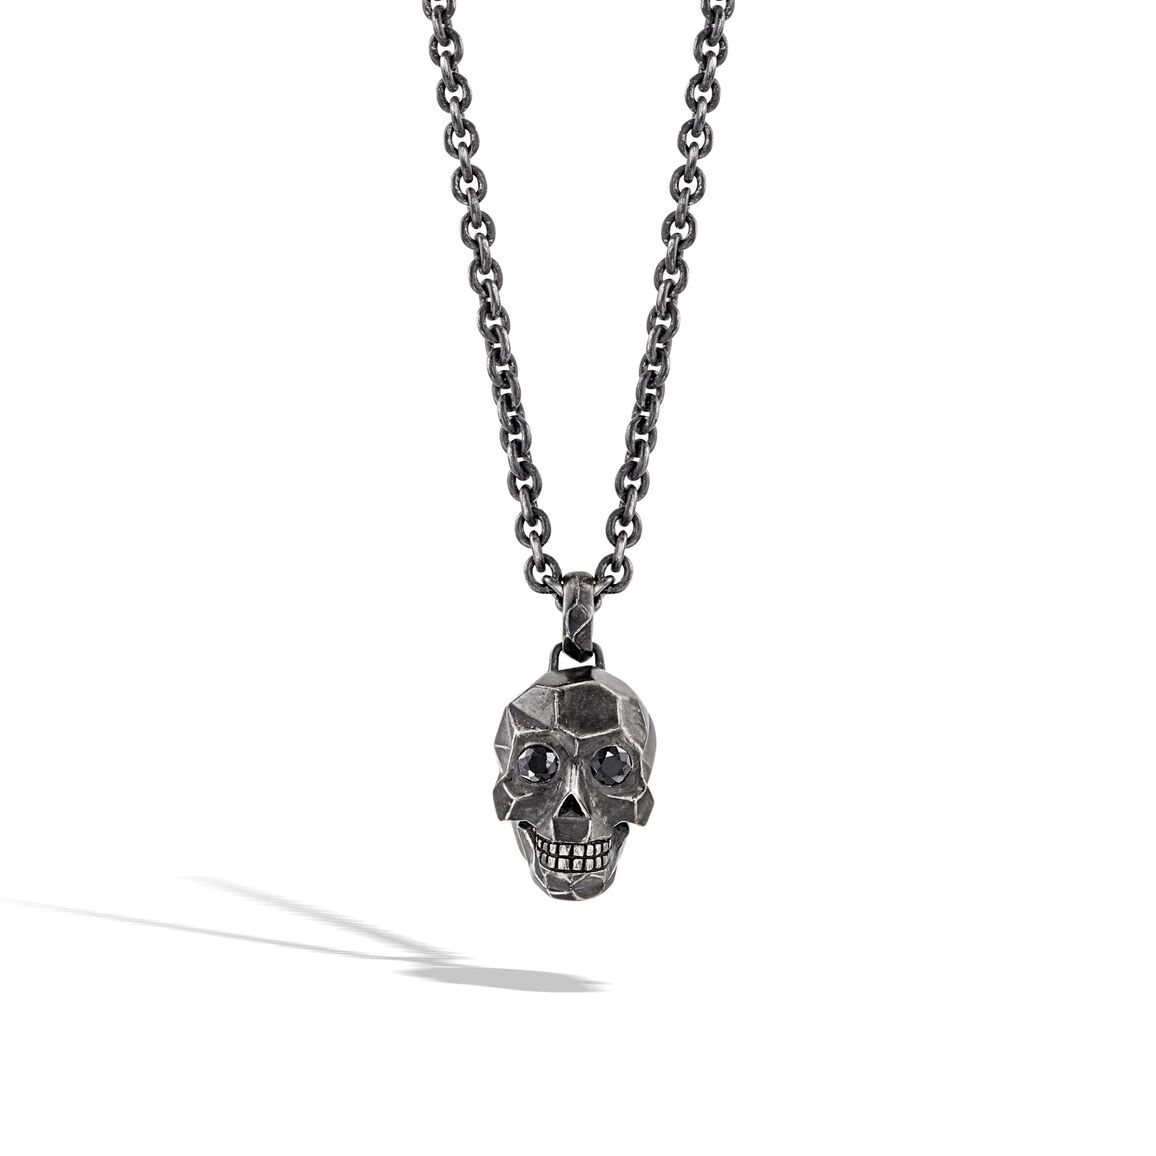 Classic Chain Skull Pendant